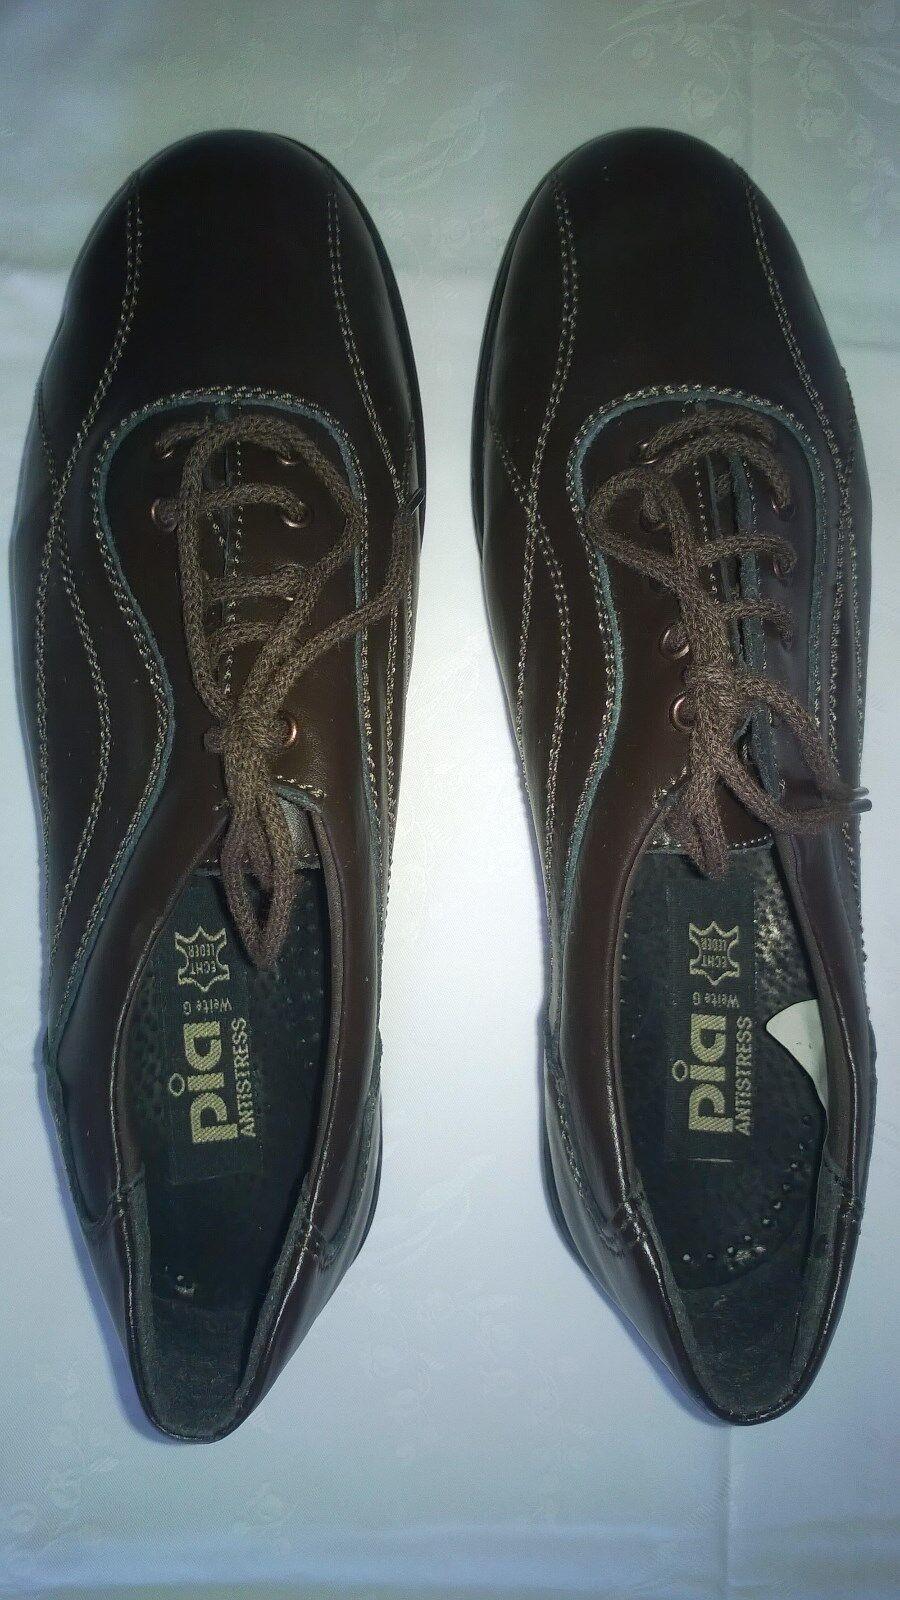 Schuhe Pia Antistress LEDER dunkelbraun Gr. 39 ECHT LEDER Antistress neu OVP 60fb84